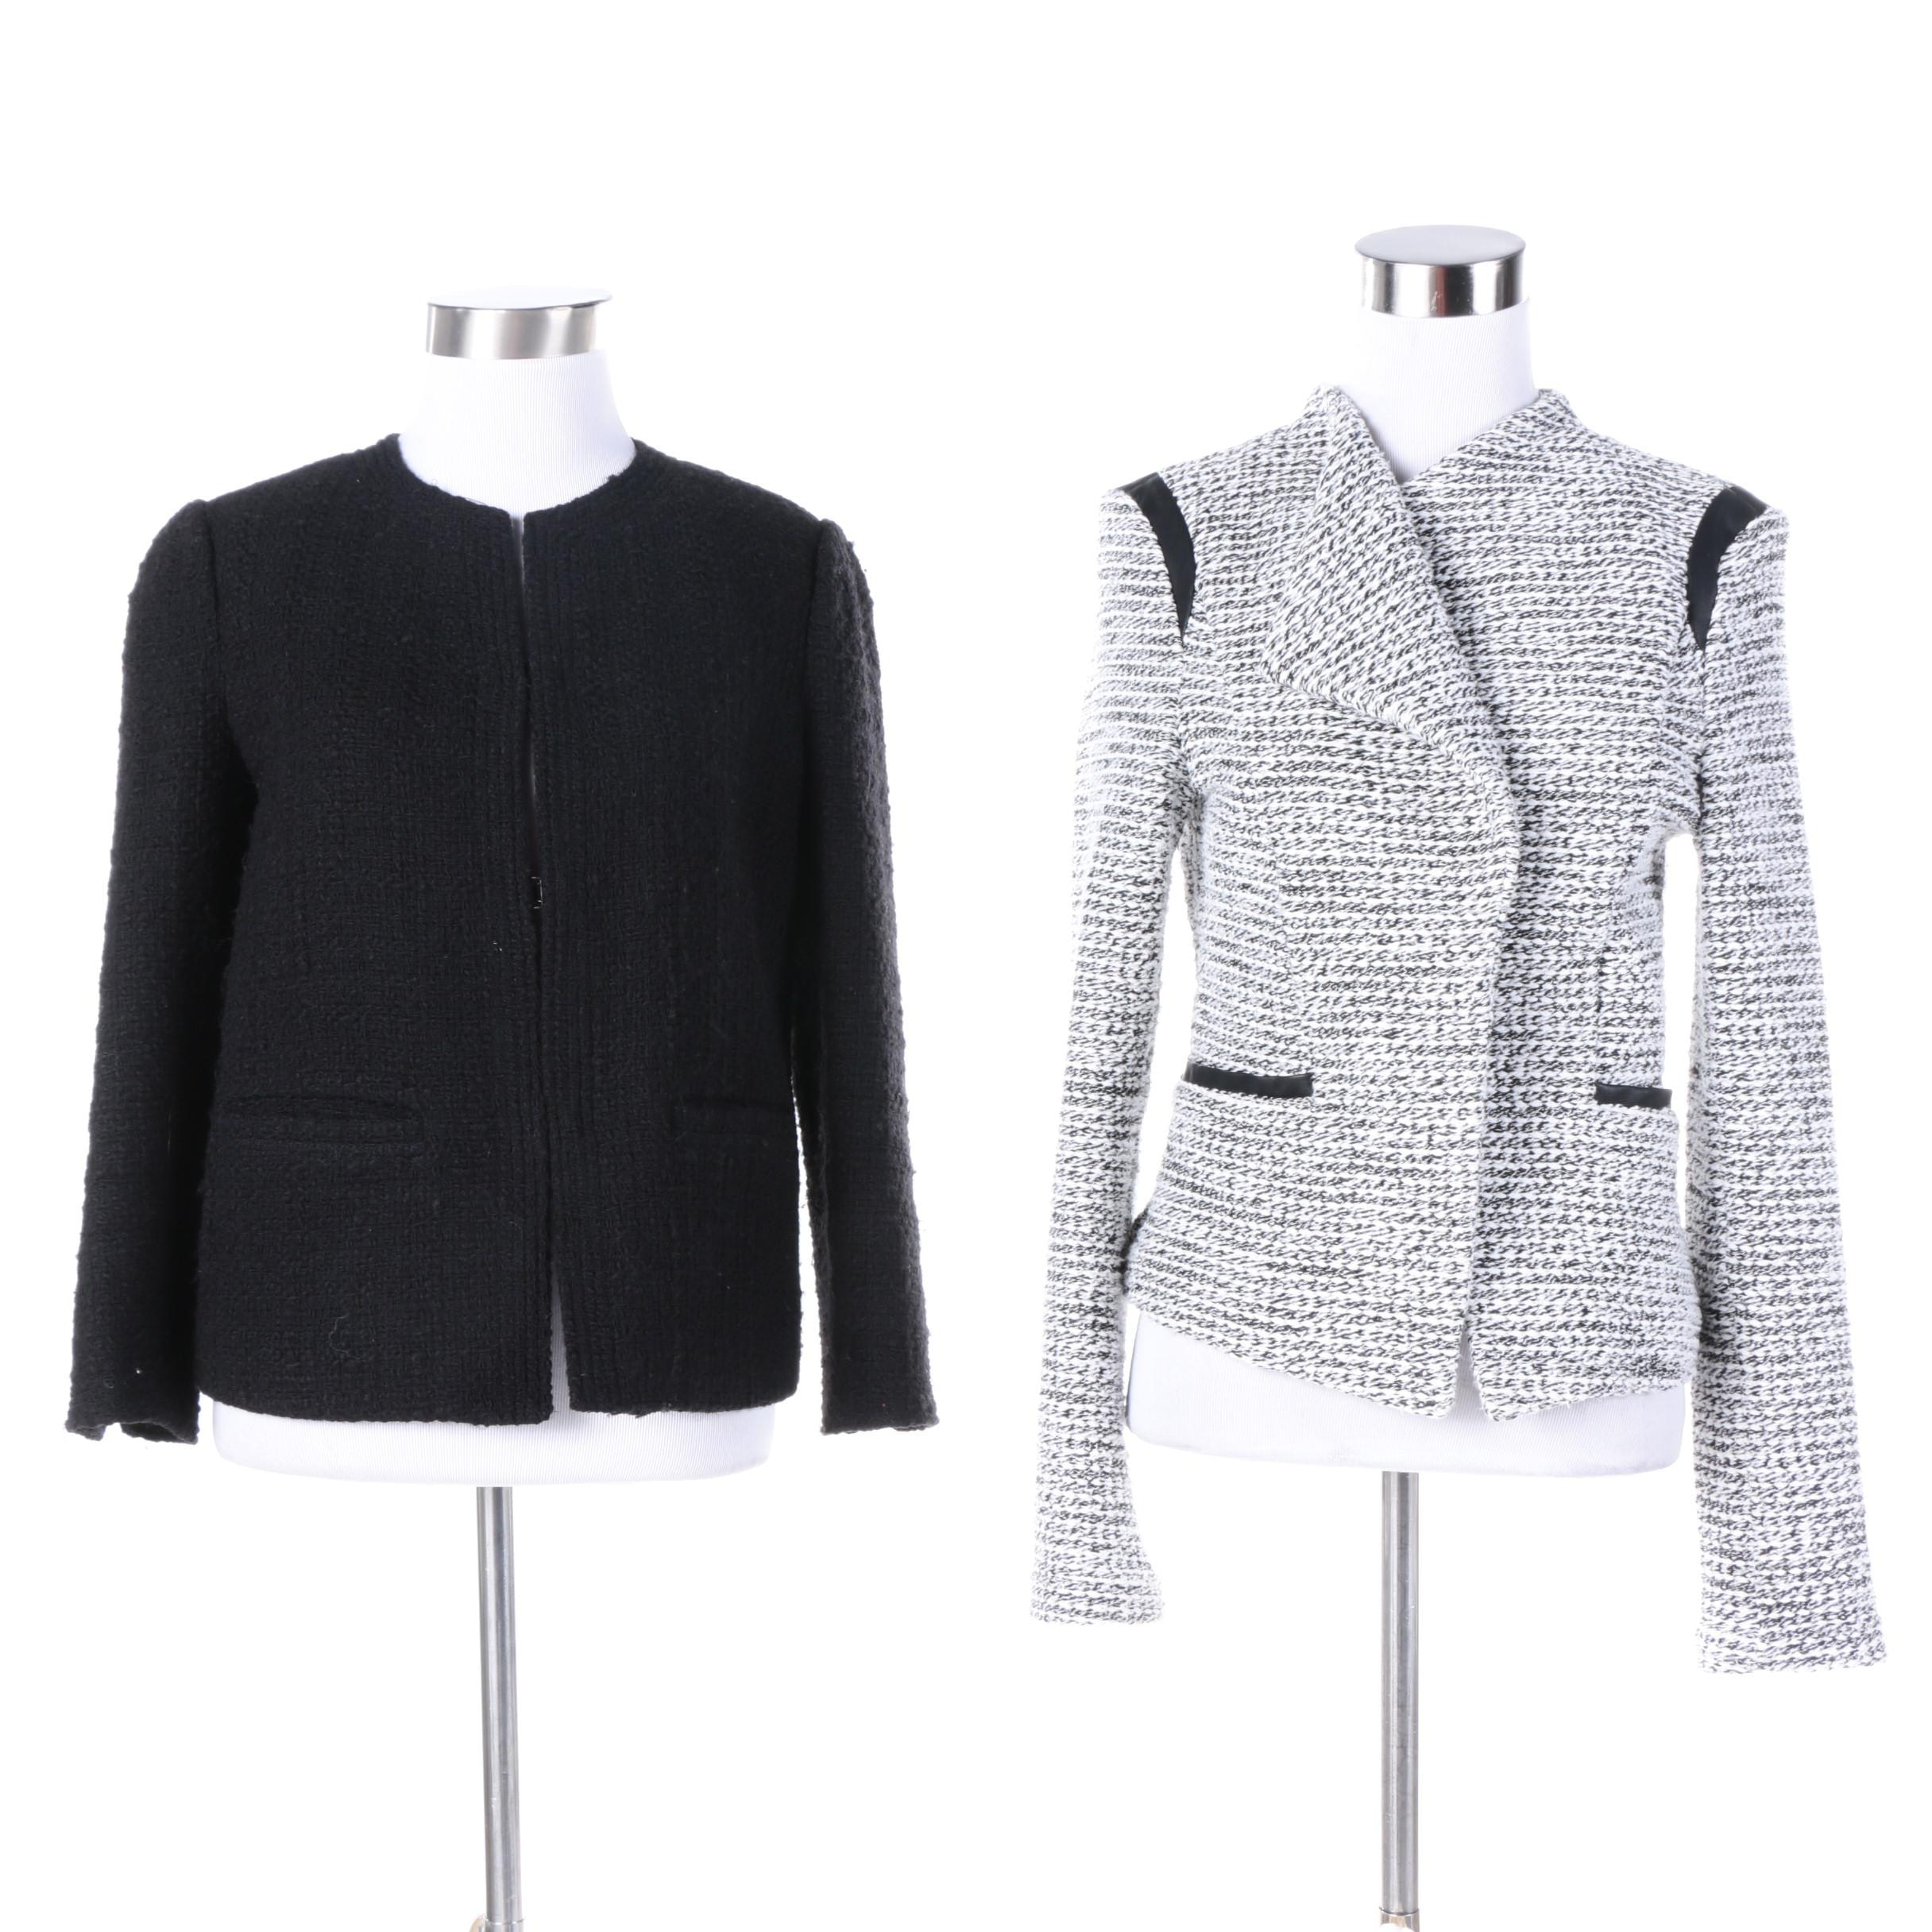 Women's Boucle Jackets Including Vince